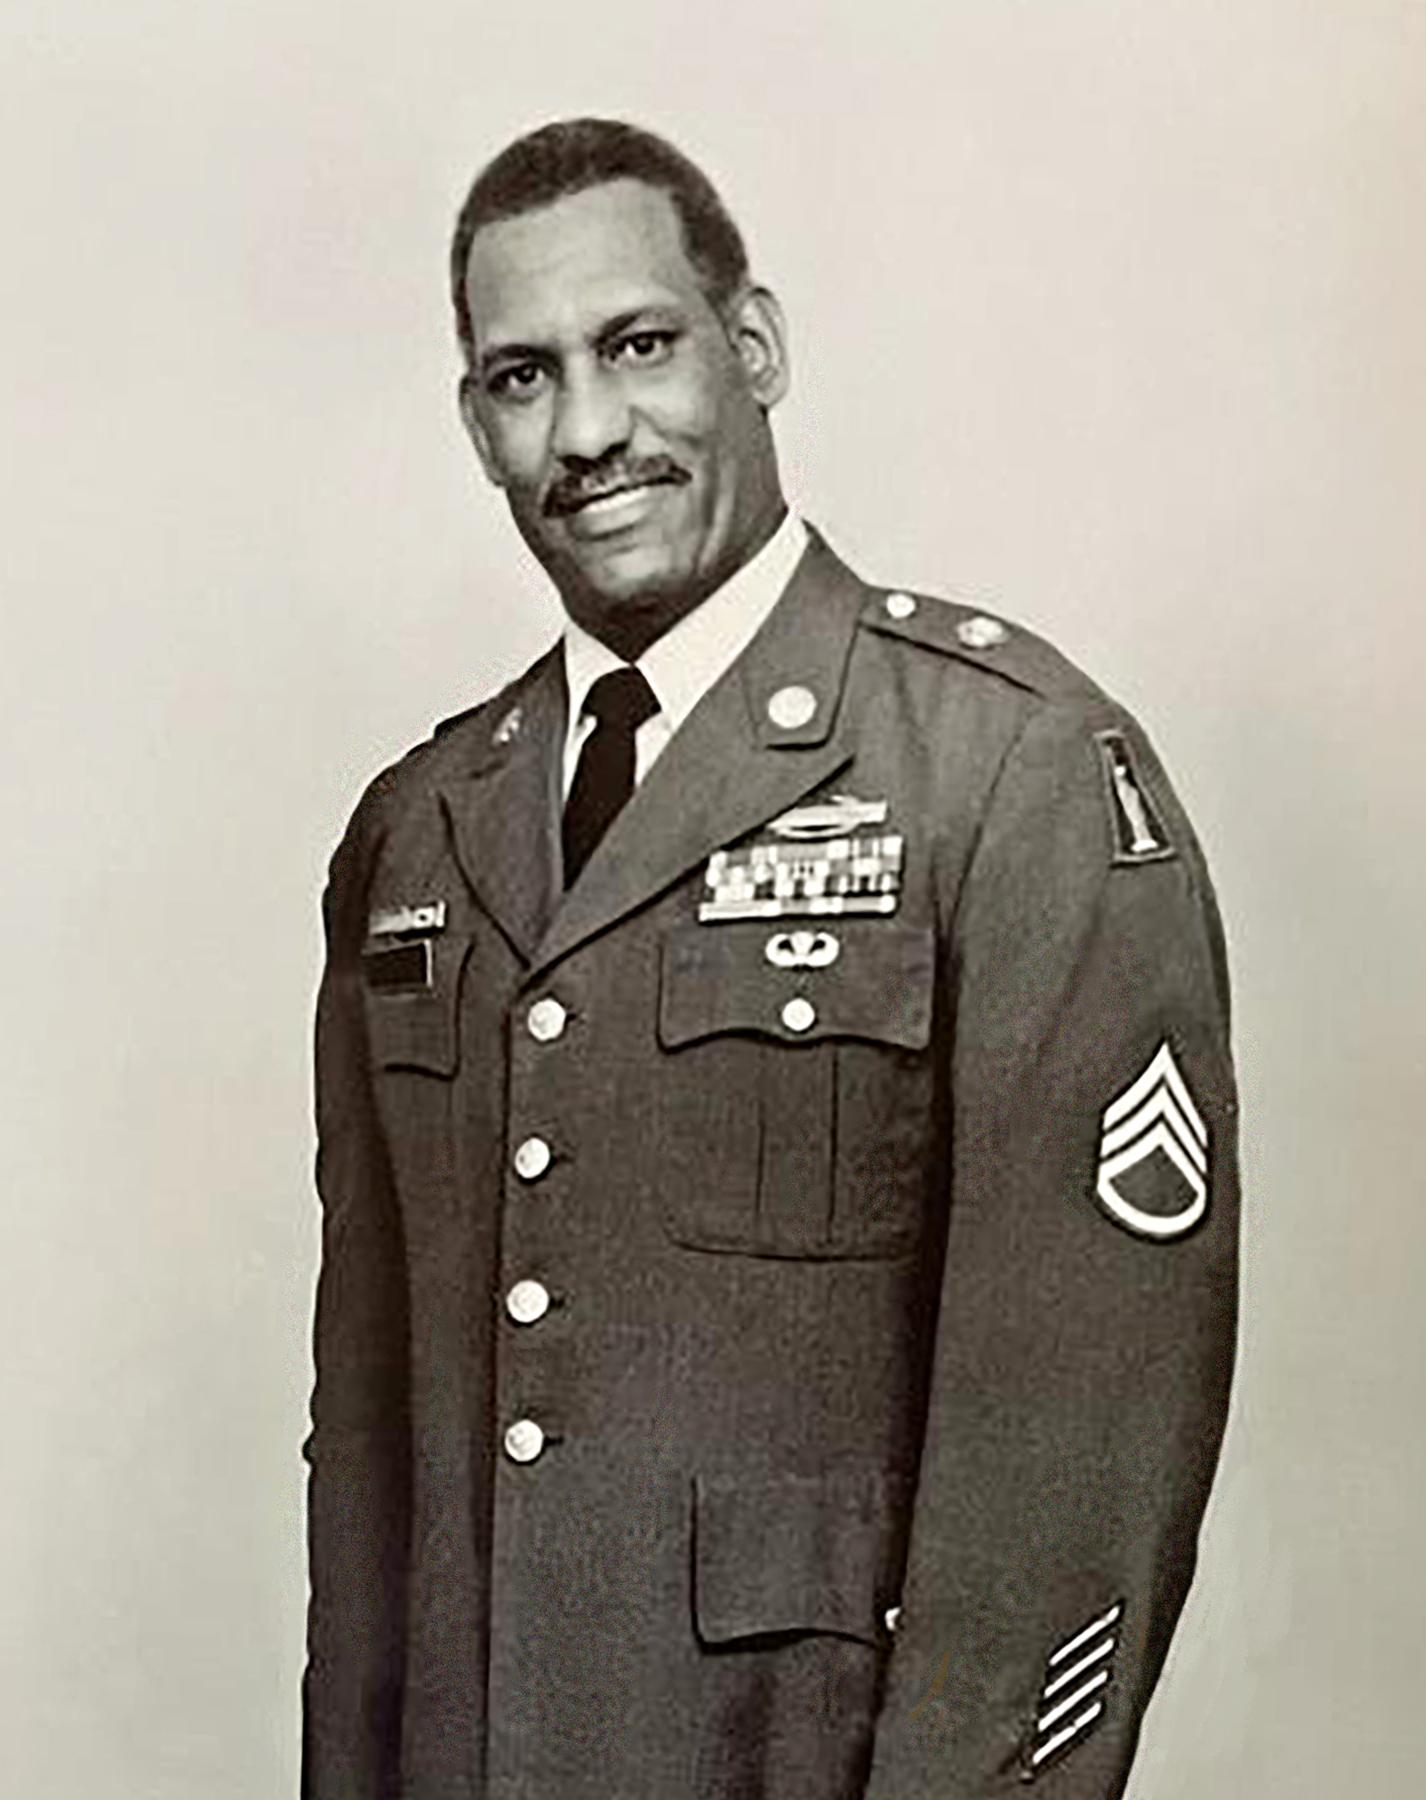 Pride in Military Service